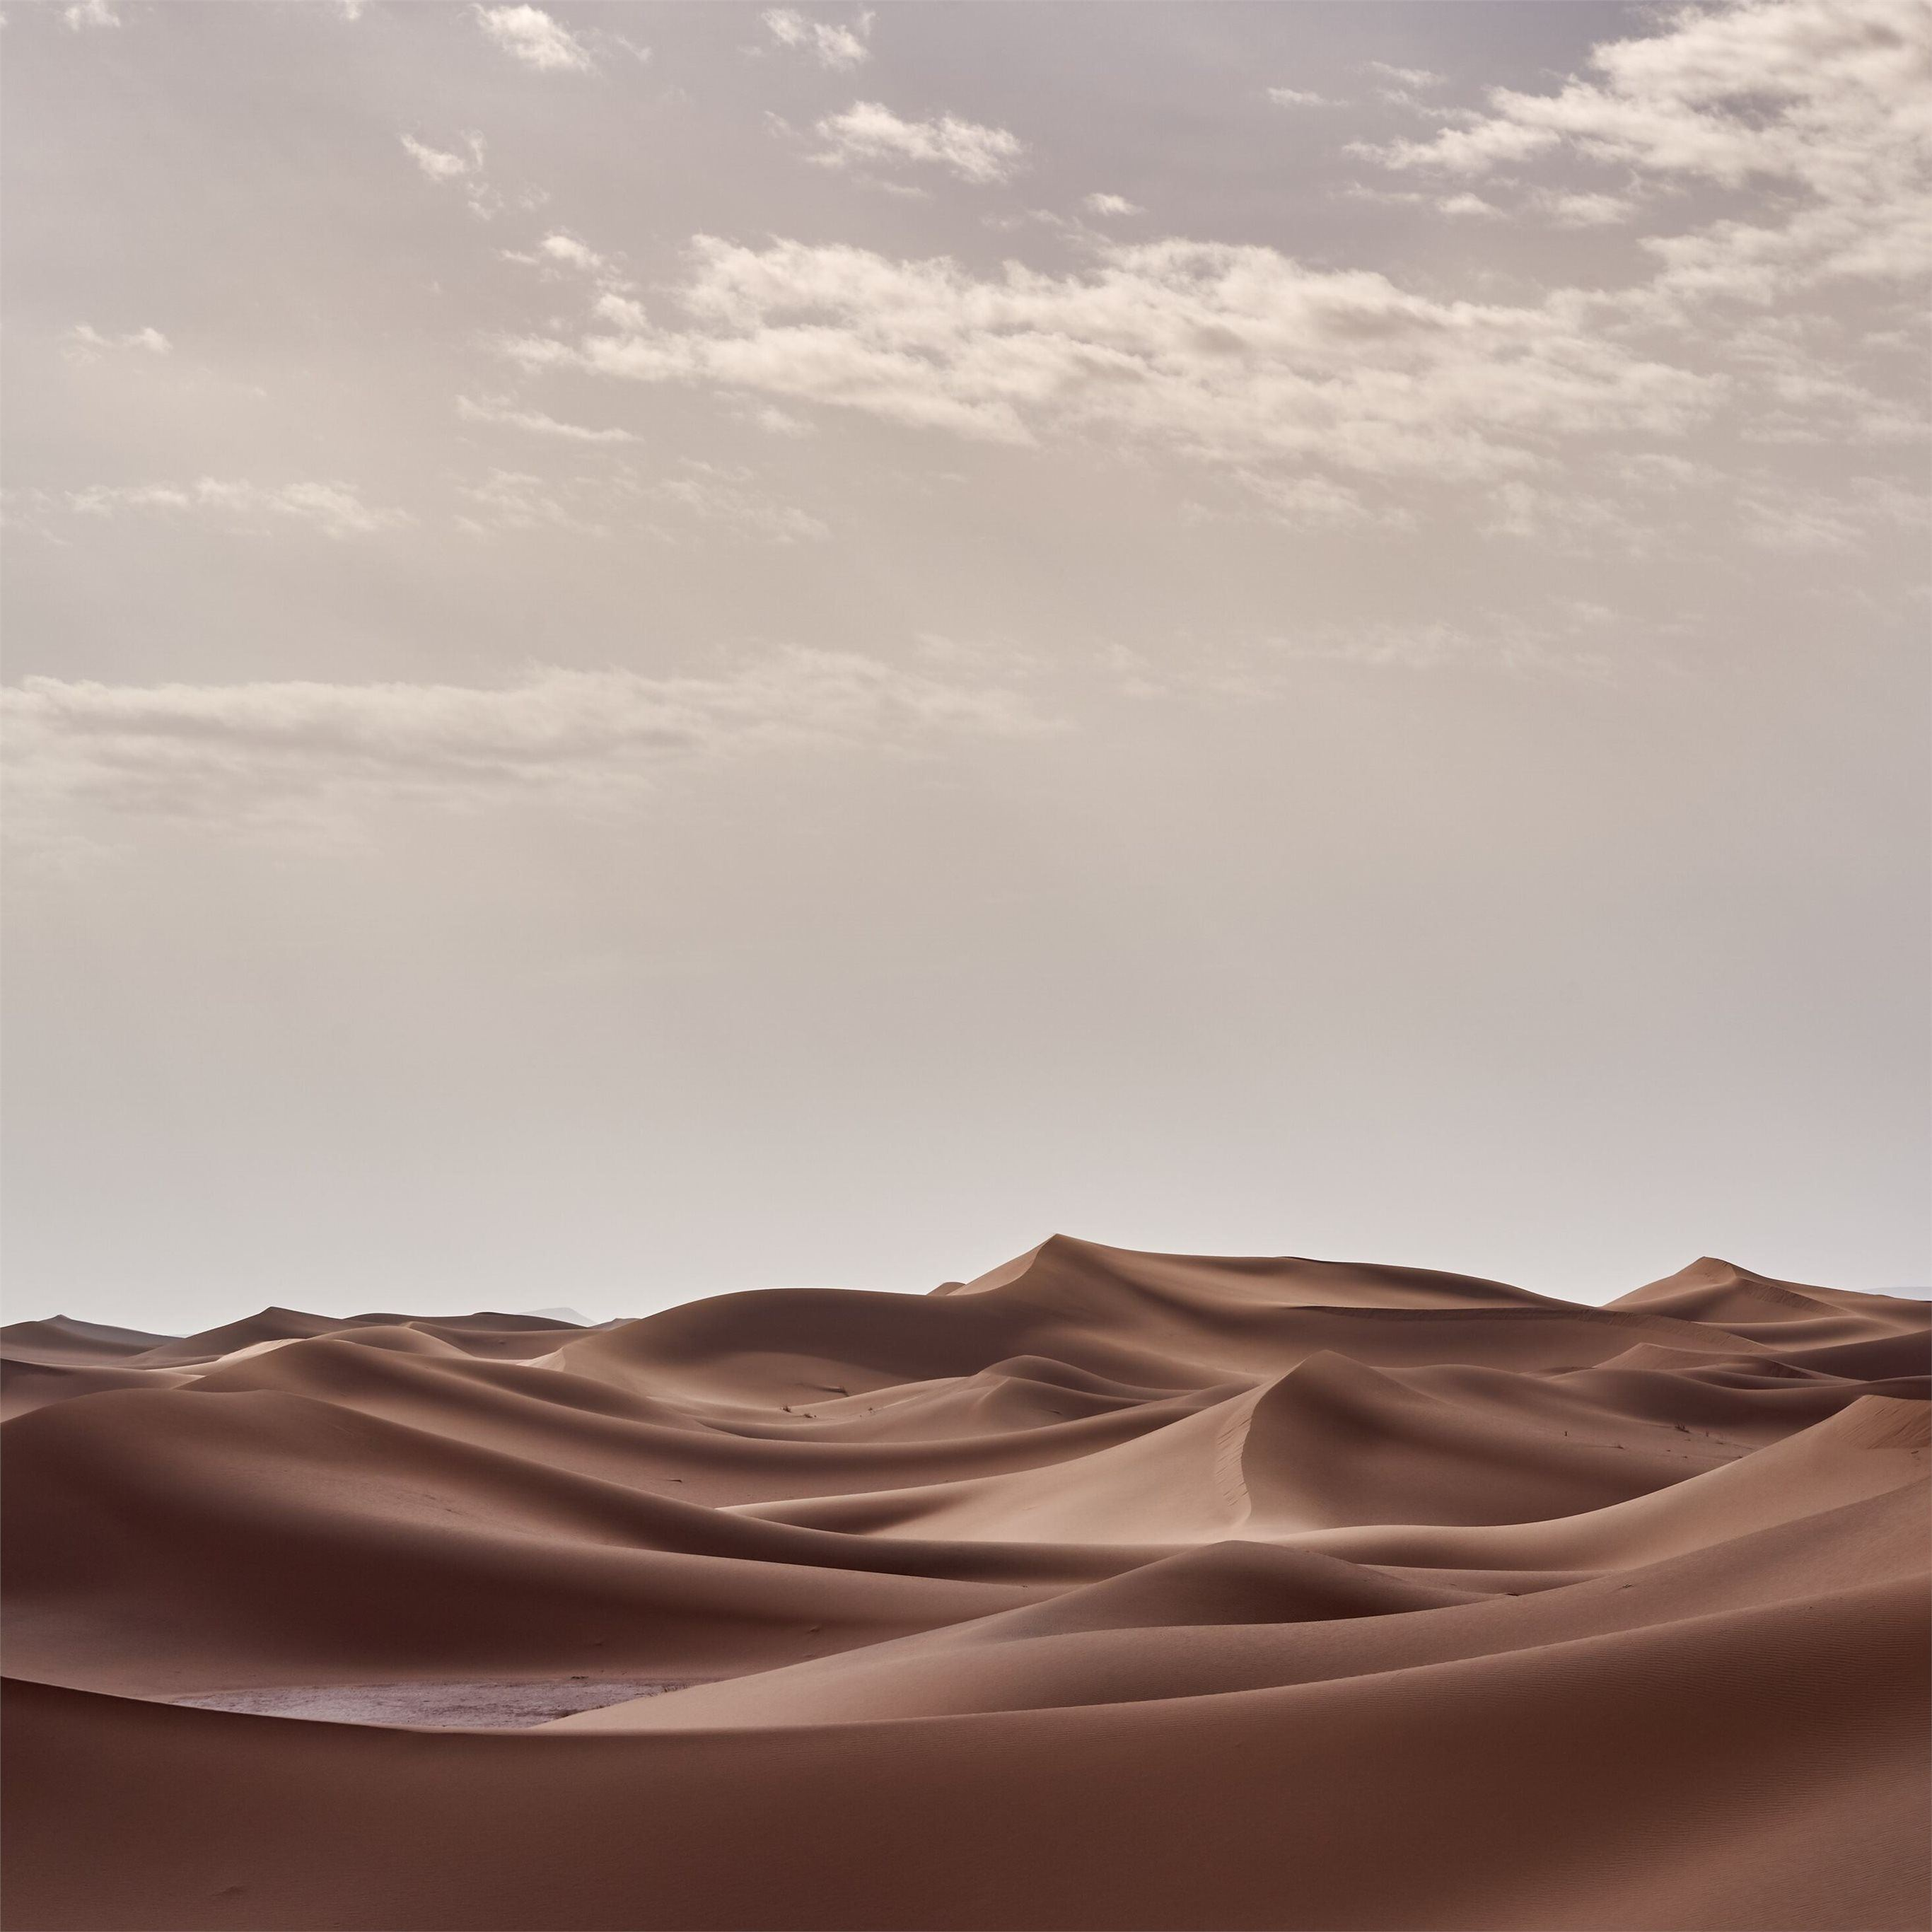 Desert Landscape Morning 4k Ipad Pro Wallpapers Free Download